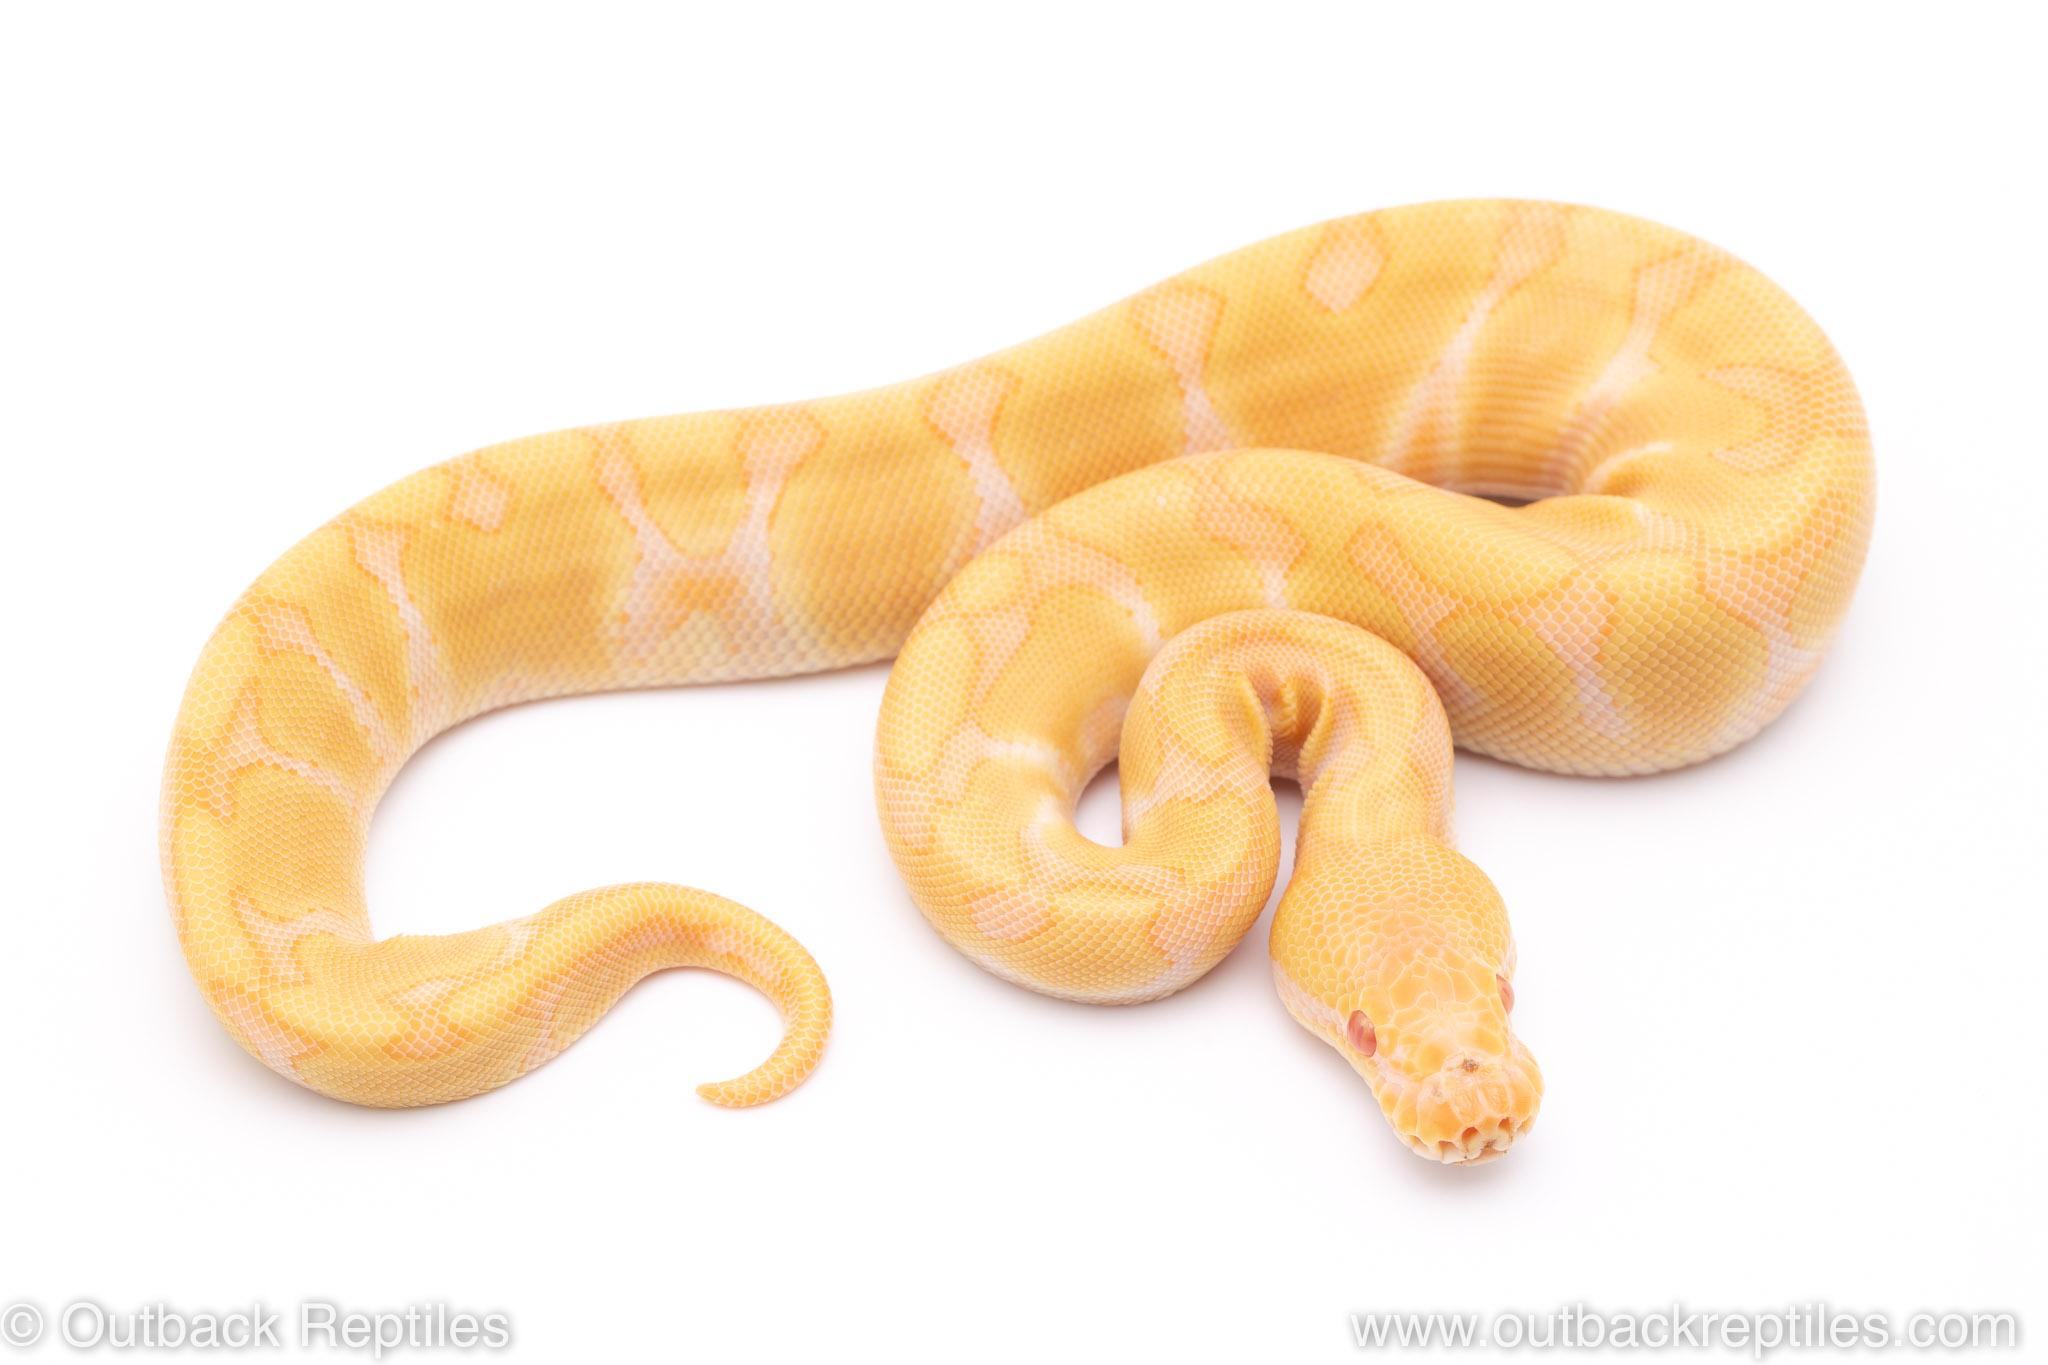 Enchi Candino ball python for sale